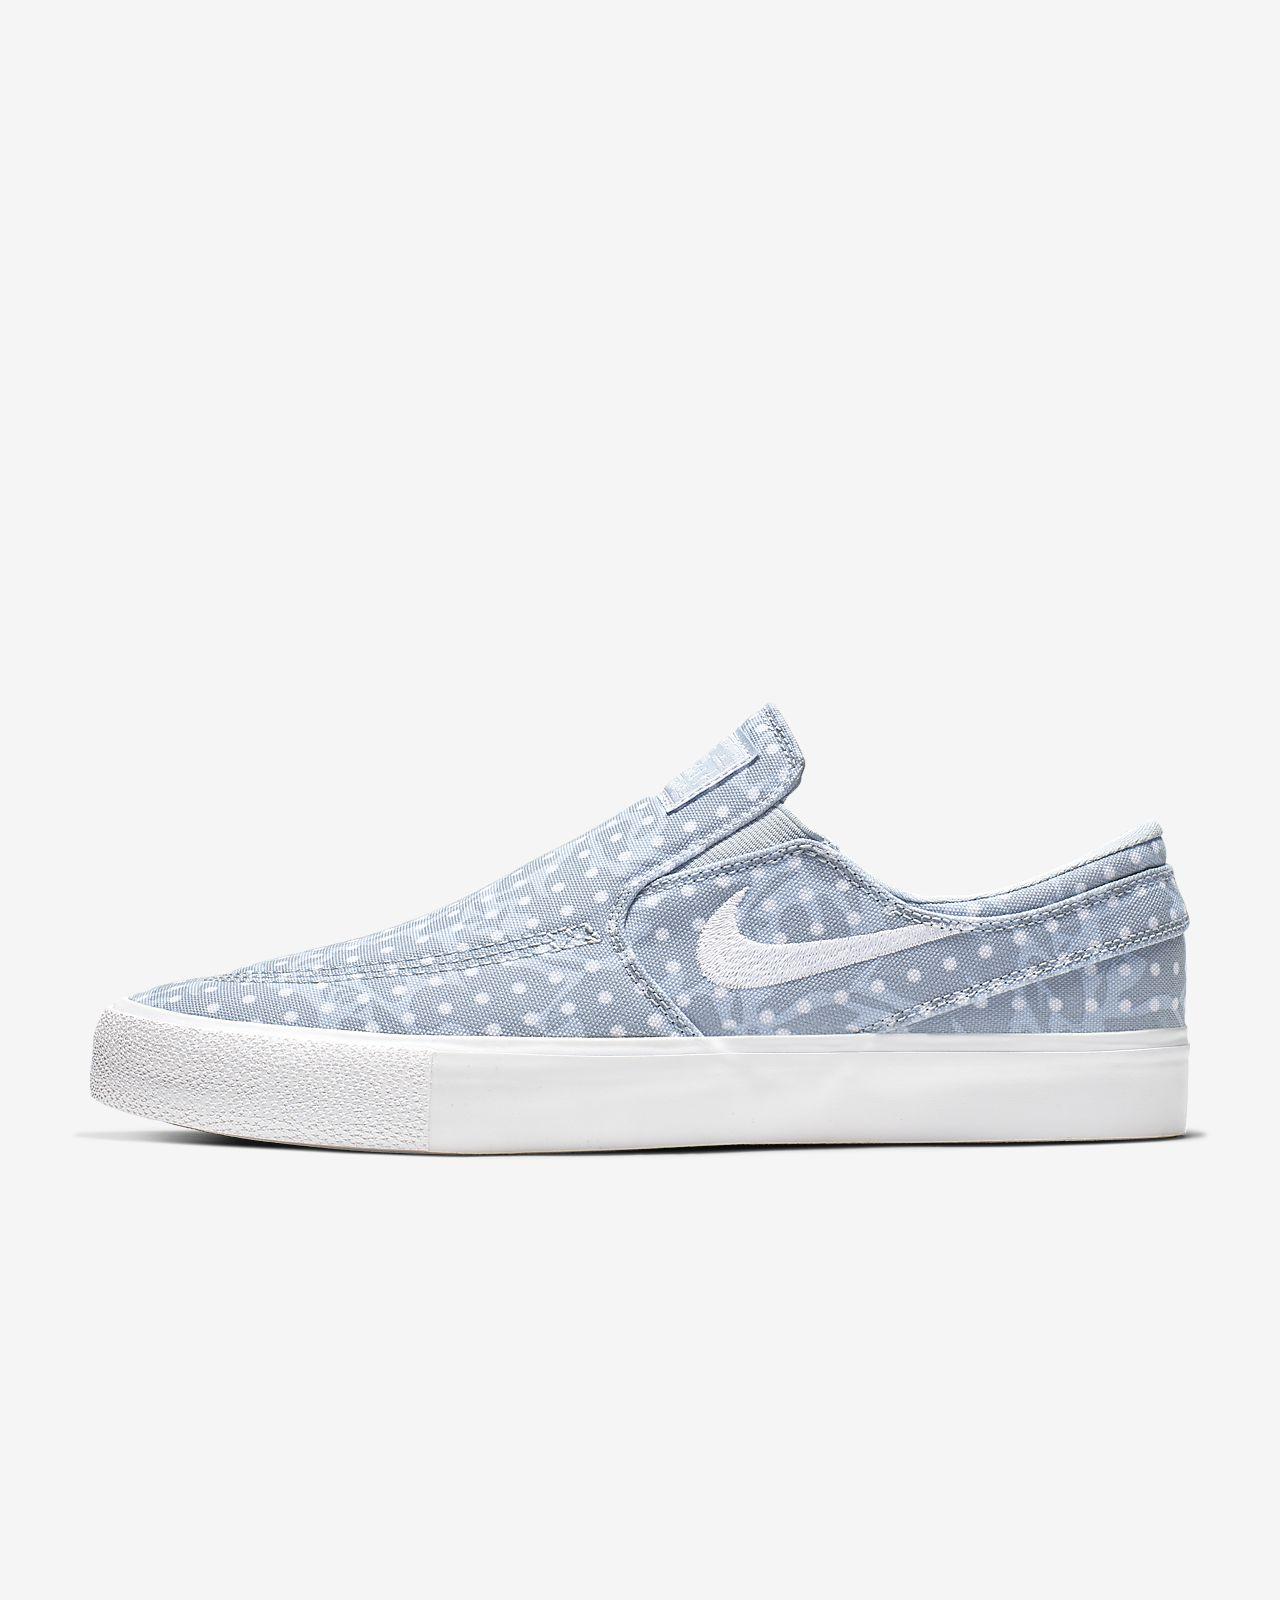 Nike Zoom Janoski Slip RM CNVS男/女滑板鞋